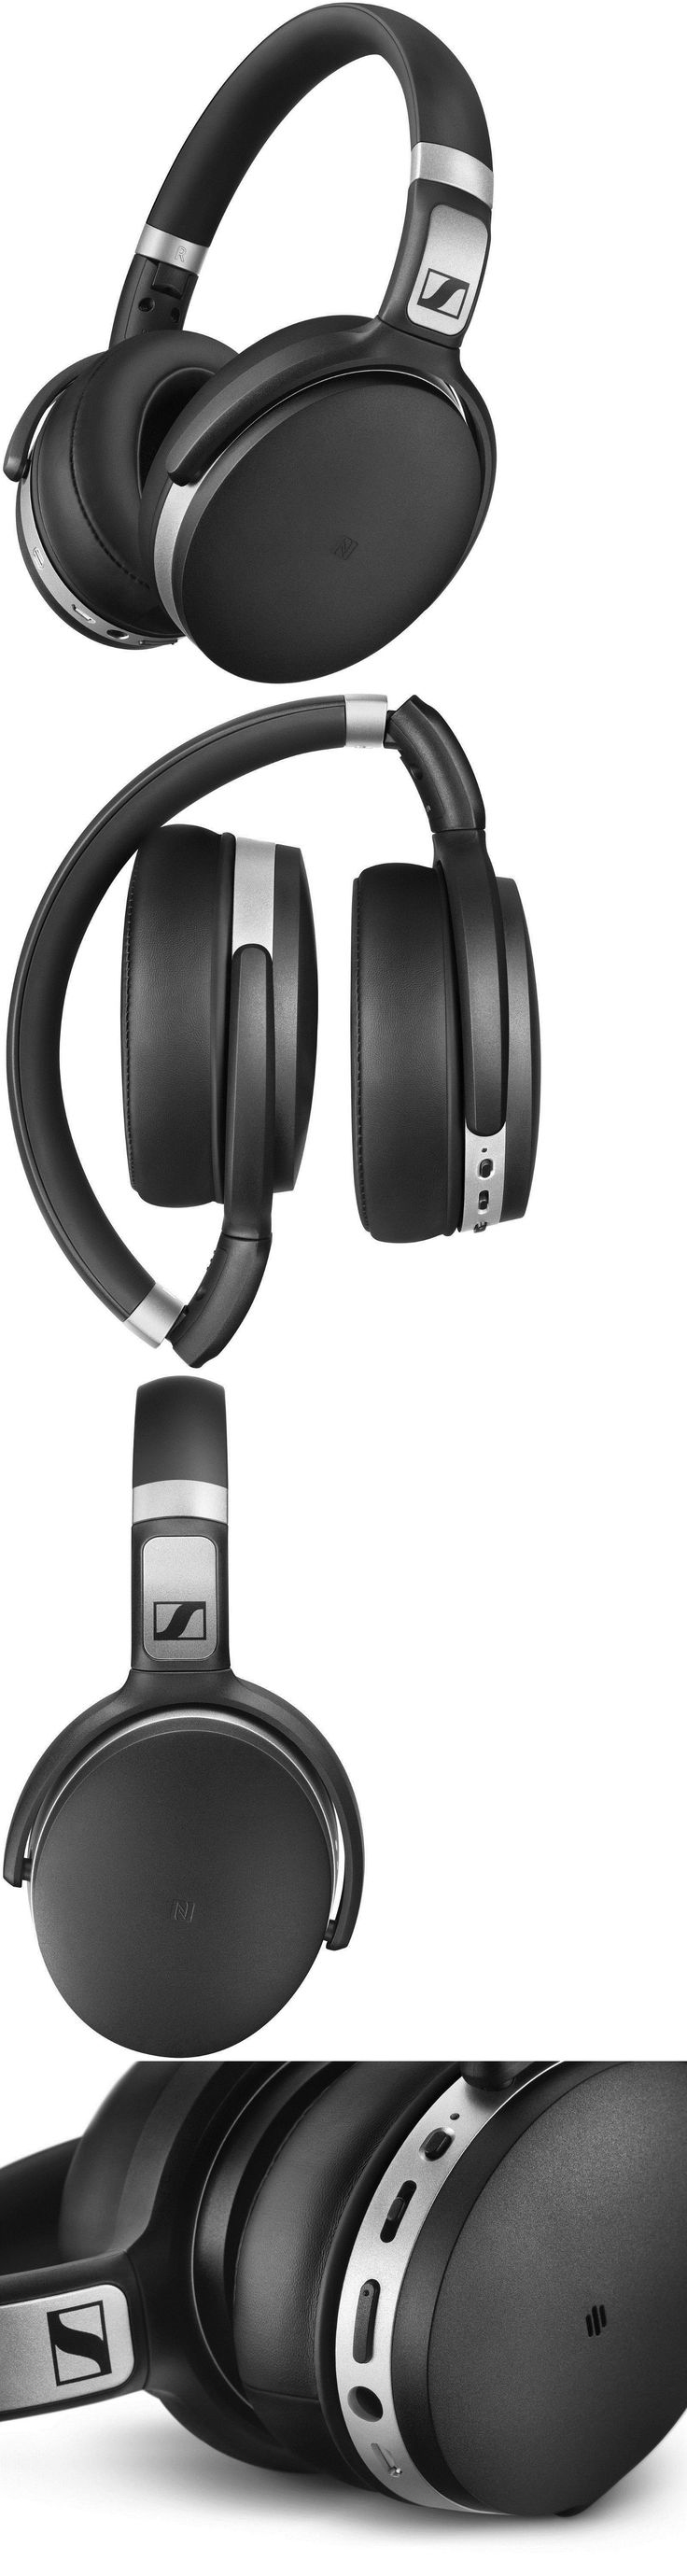 Headphones: Sennheiser Hd 4.50 Btnc Bluetooth Noise Cancelling Headphones W Warranty -> BUY IT NOW ONLY: $139.99 on eBay!